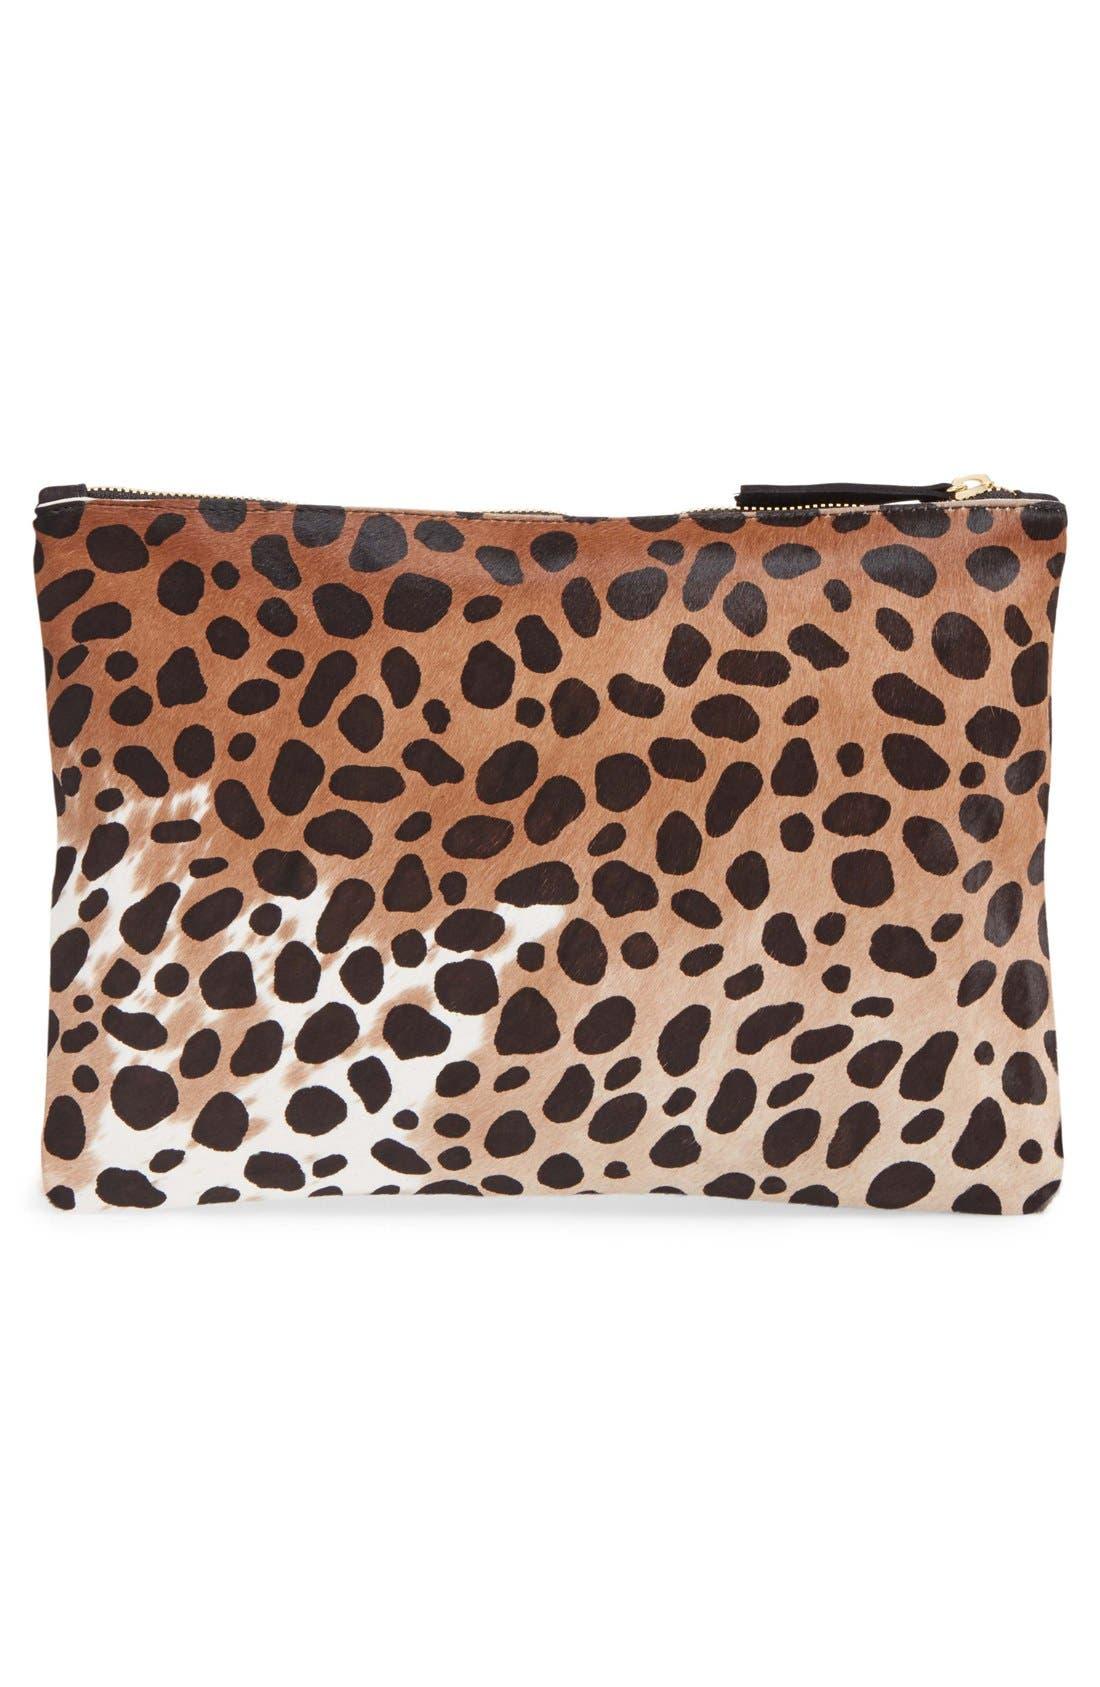 Genuine Calf Hair Leopard Print Zip Clutch,                             Alternate thumbnail 3, color,                             250